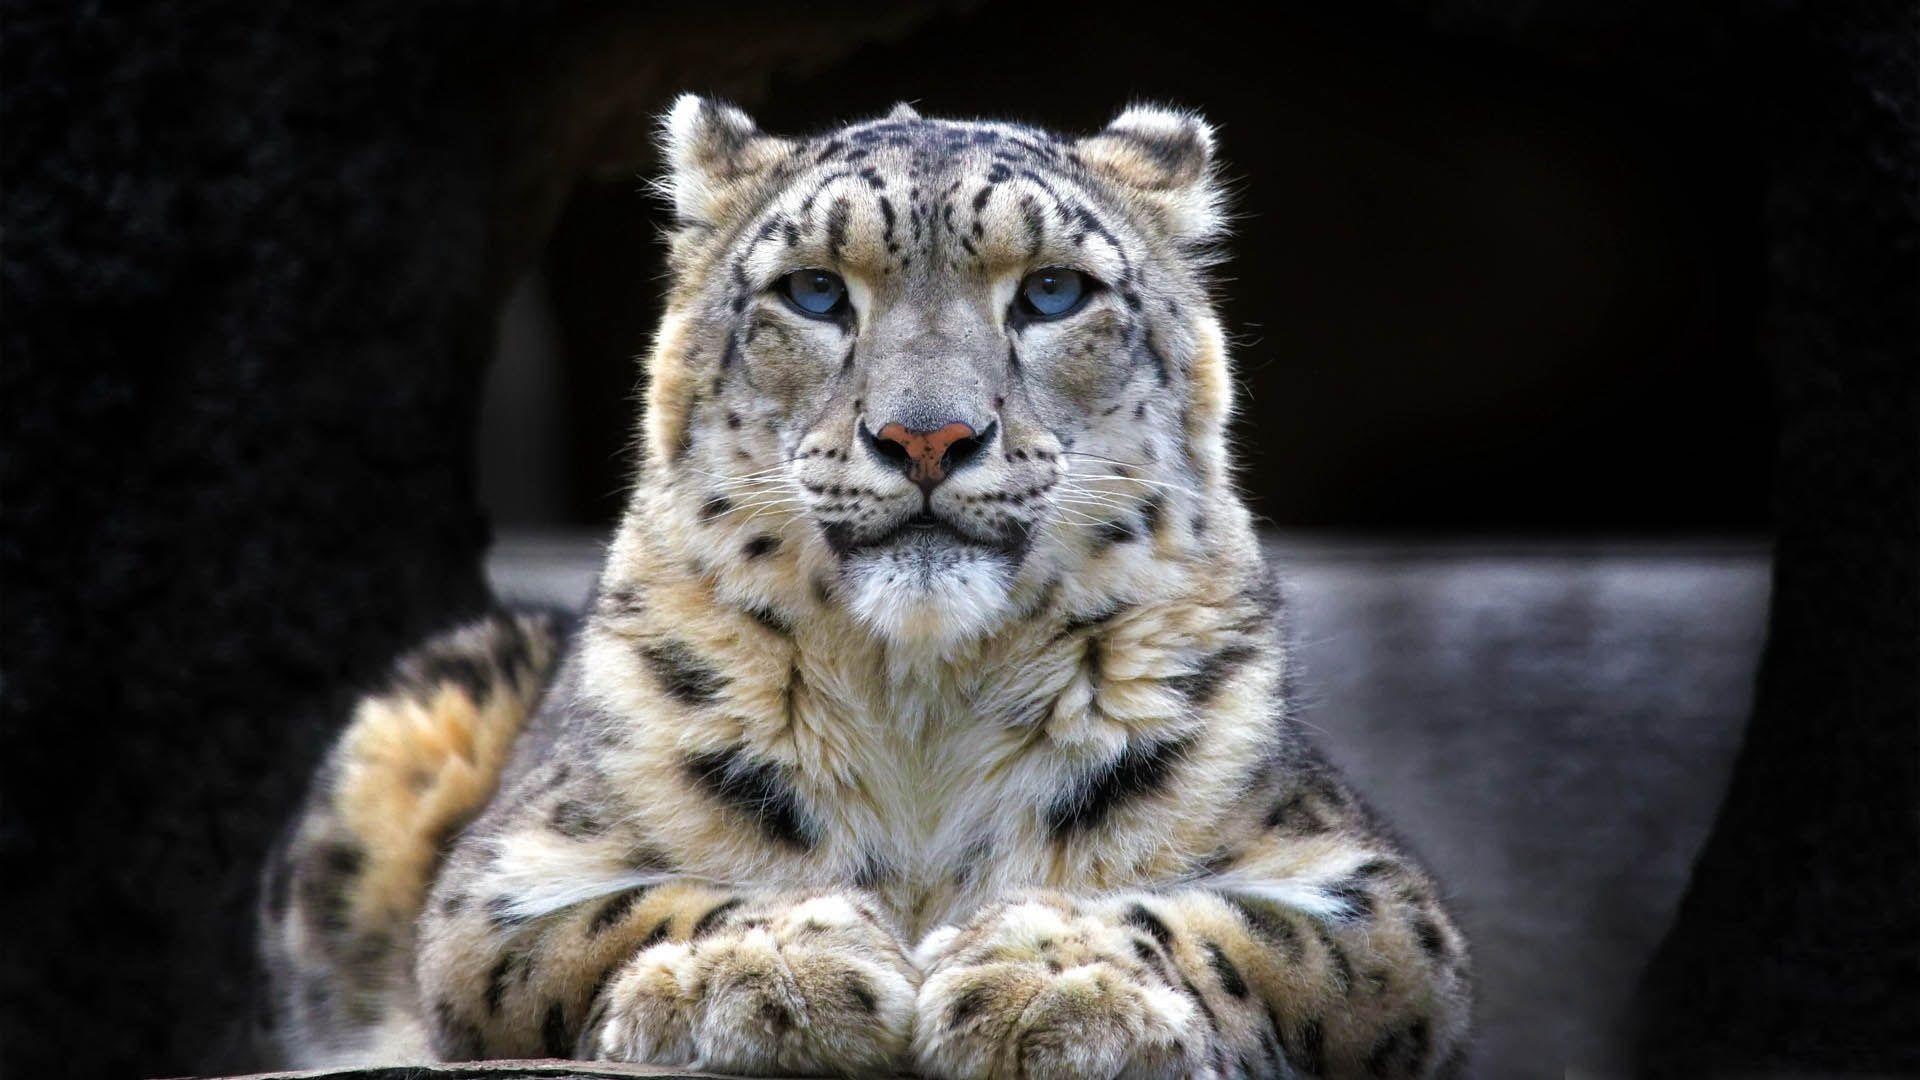 snow leopard wallpaper | 1920x1080 | #59083